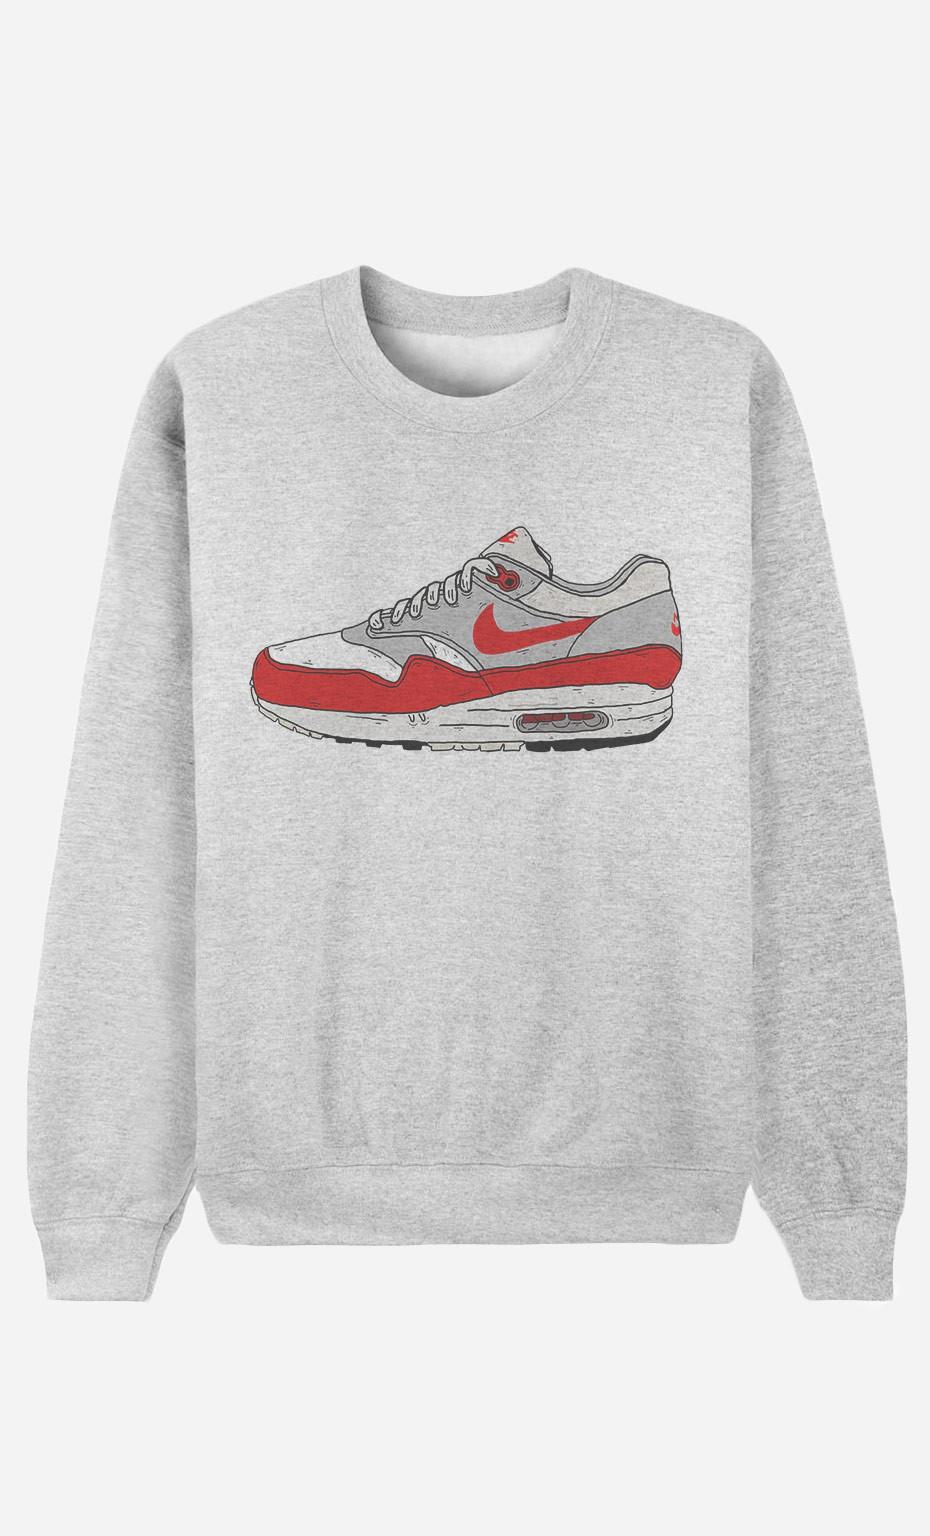 Sweatshirt OG Air Max